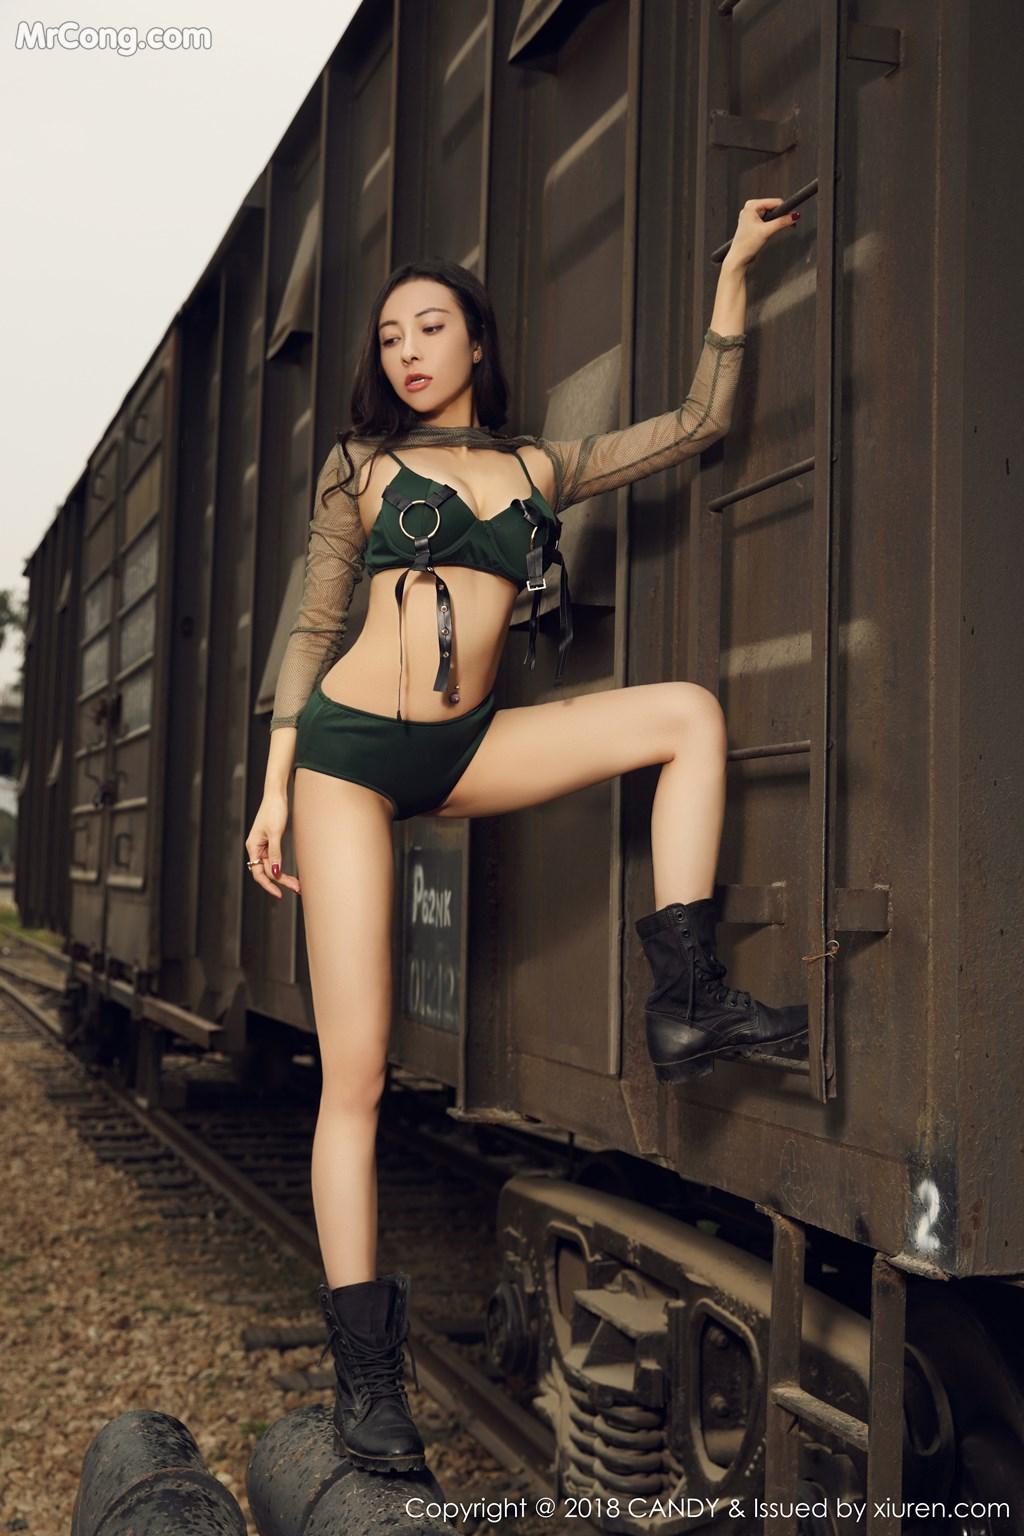 Image CANDY-Vol.061-Victoria-Guo-Er-MrCong.com-010 in post CANDY Vol.061: Người mẫu Victoria (果儿) (39 ảnh)